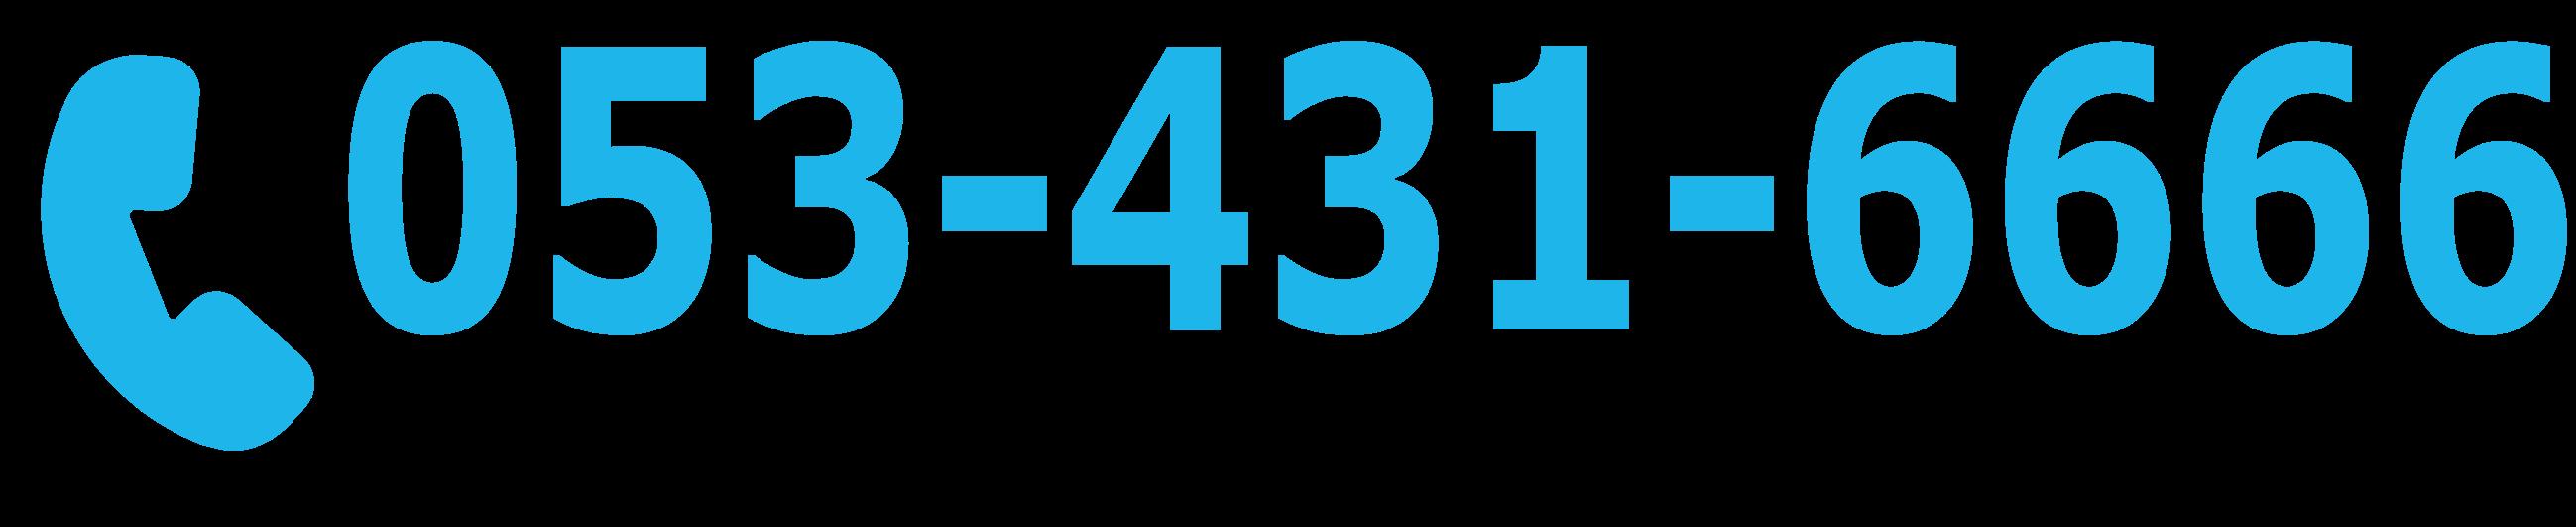 053-431-6666